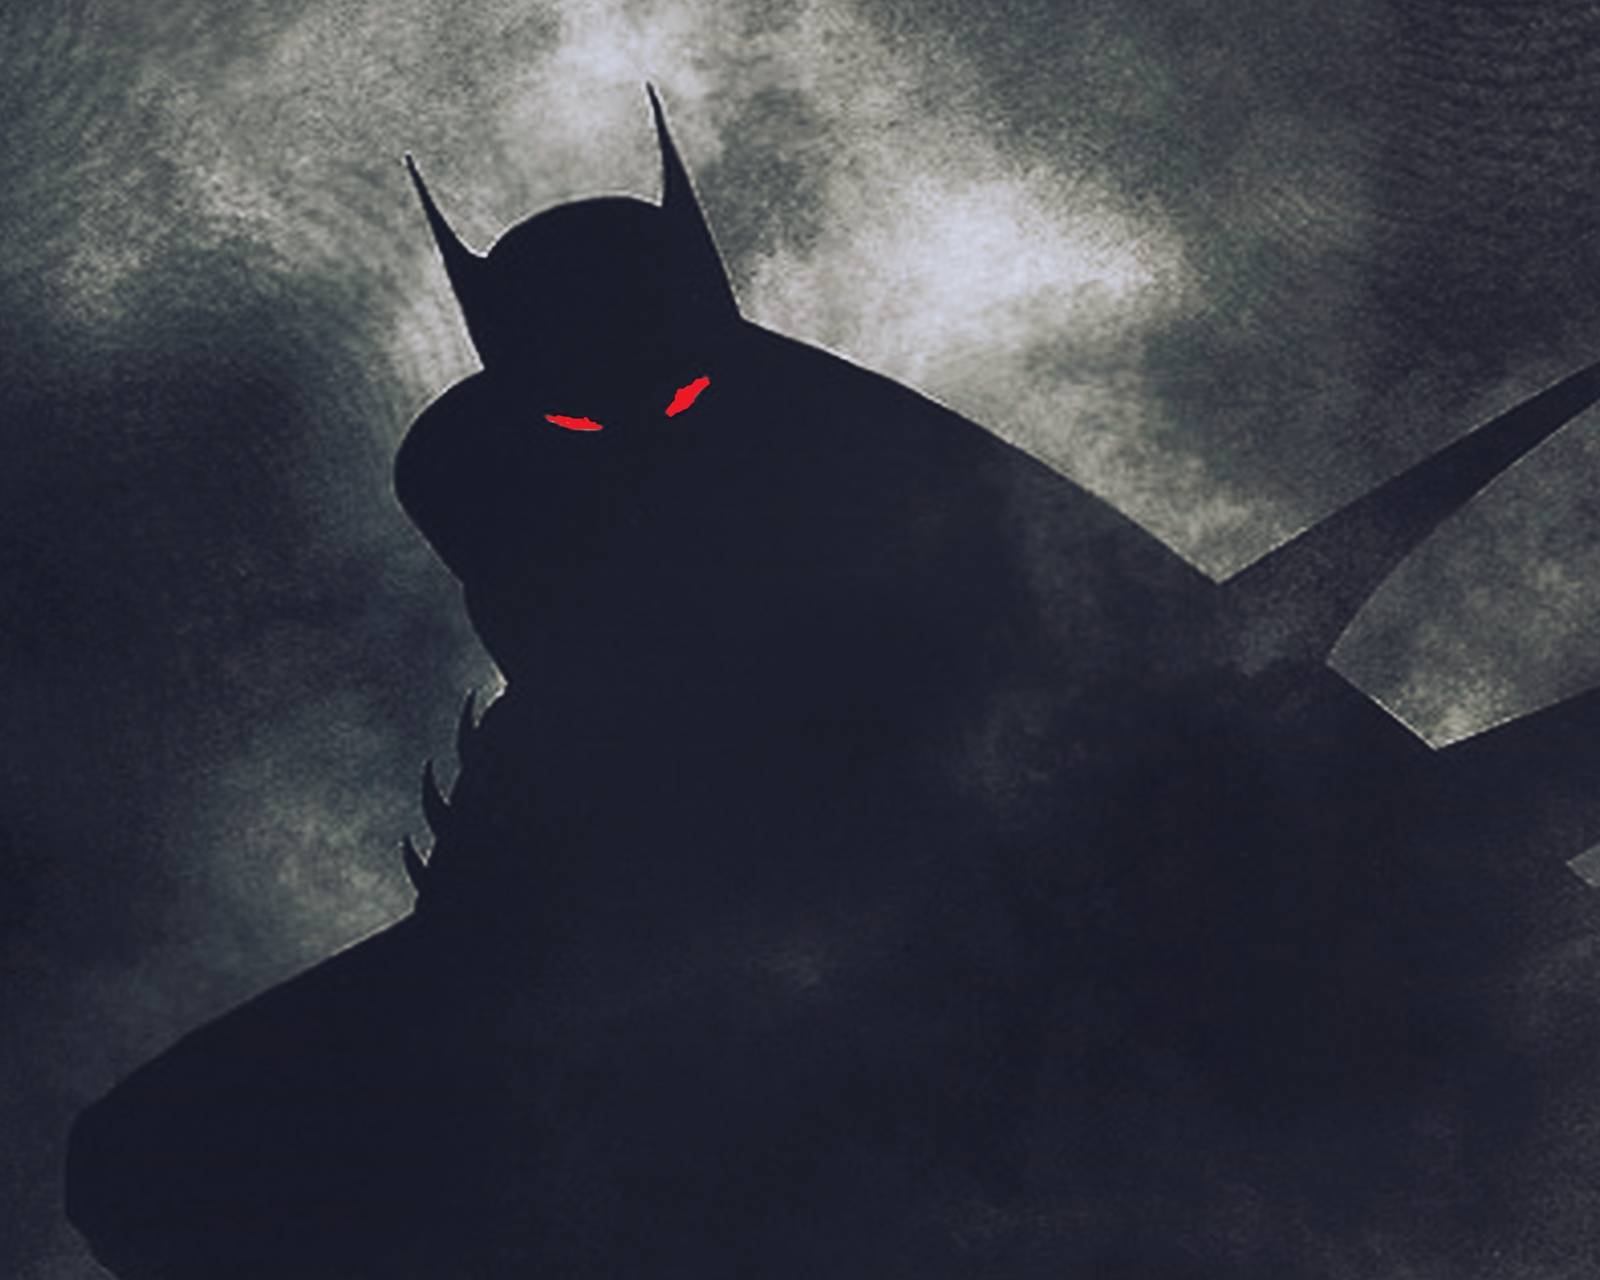 batmans shadow